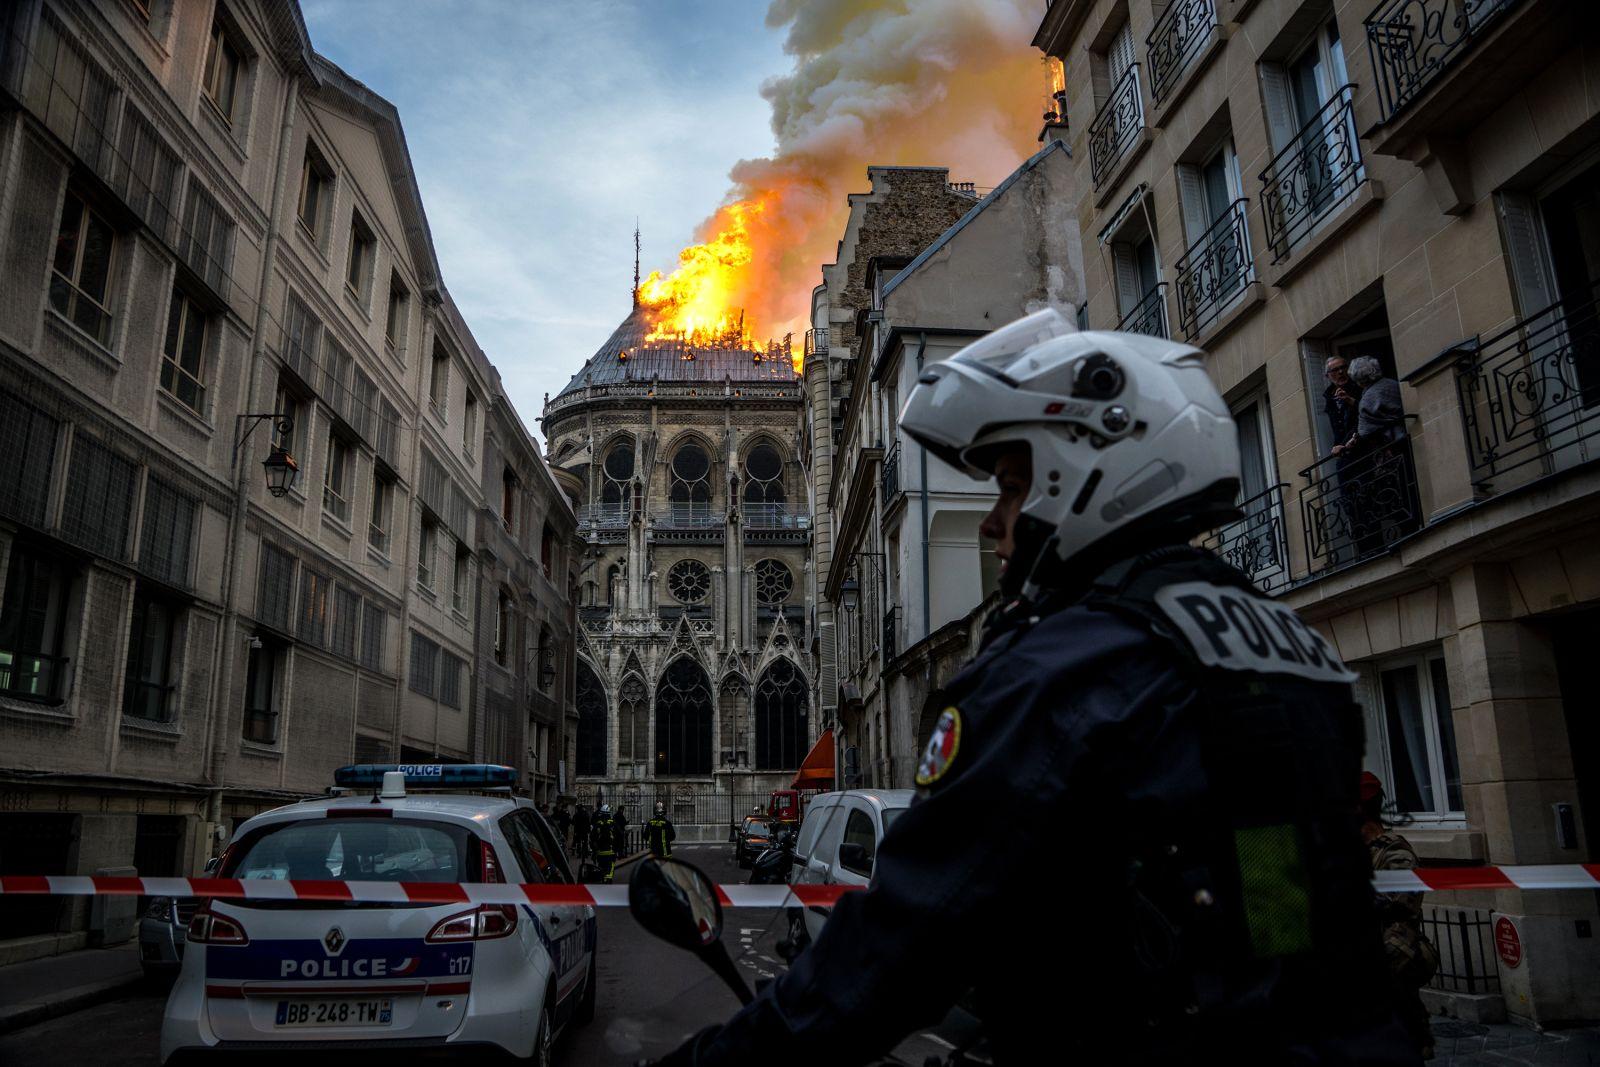 notredame katedrali büyüklüğü https://huglero.com